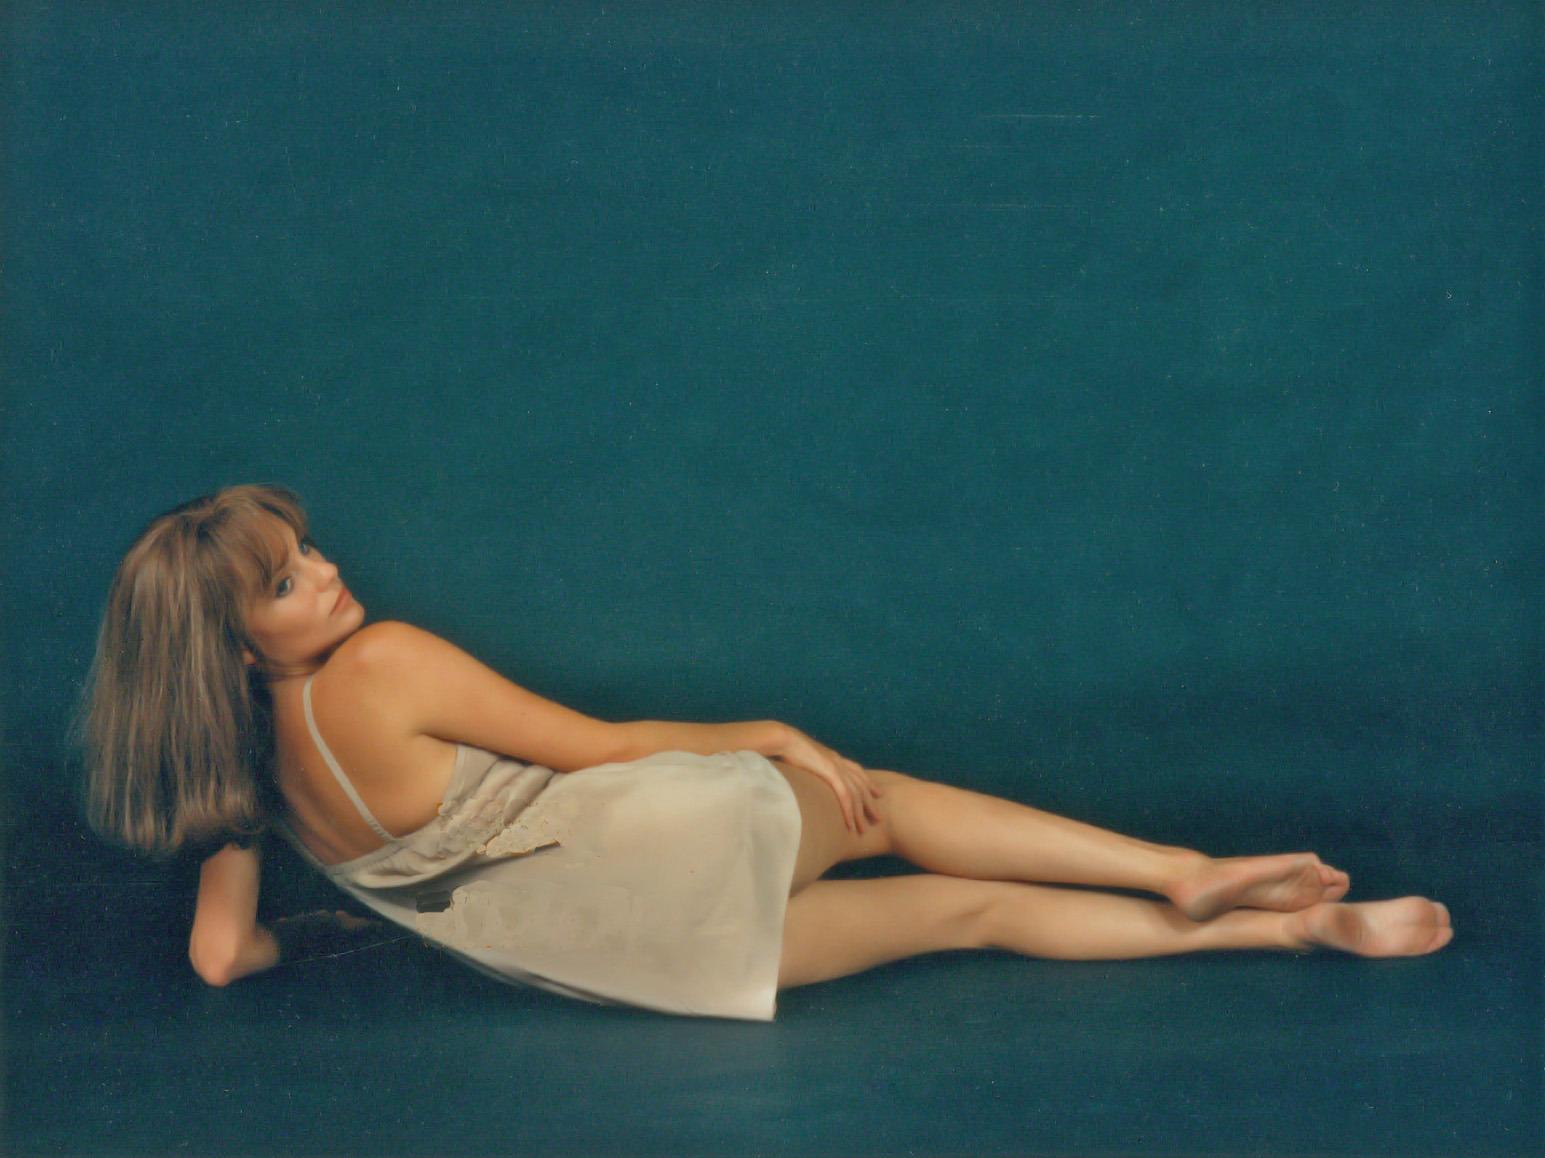 Jacqueline Bisset's Feet